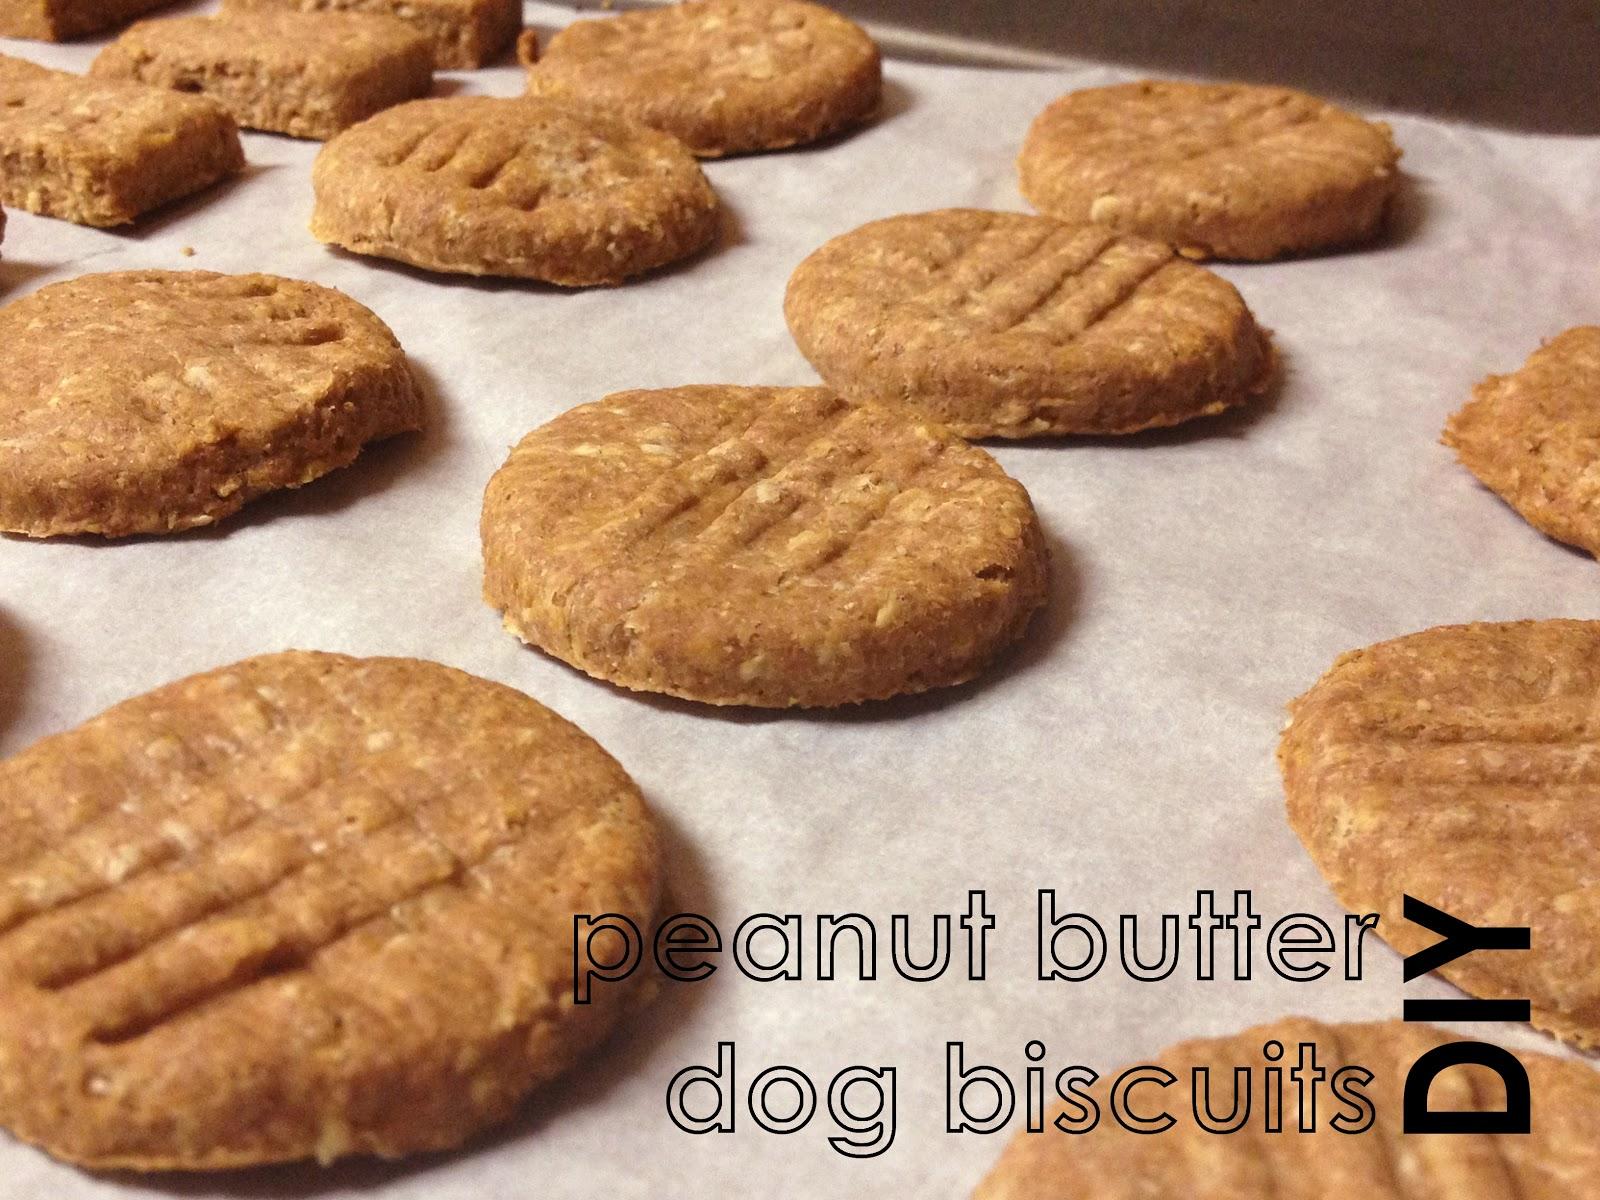 we have chemistry together dog biscuits